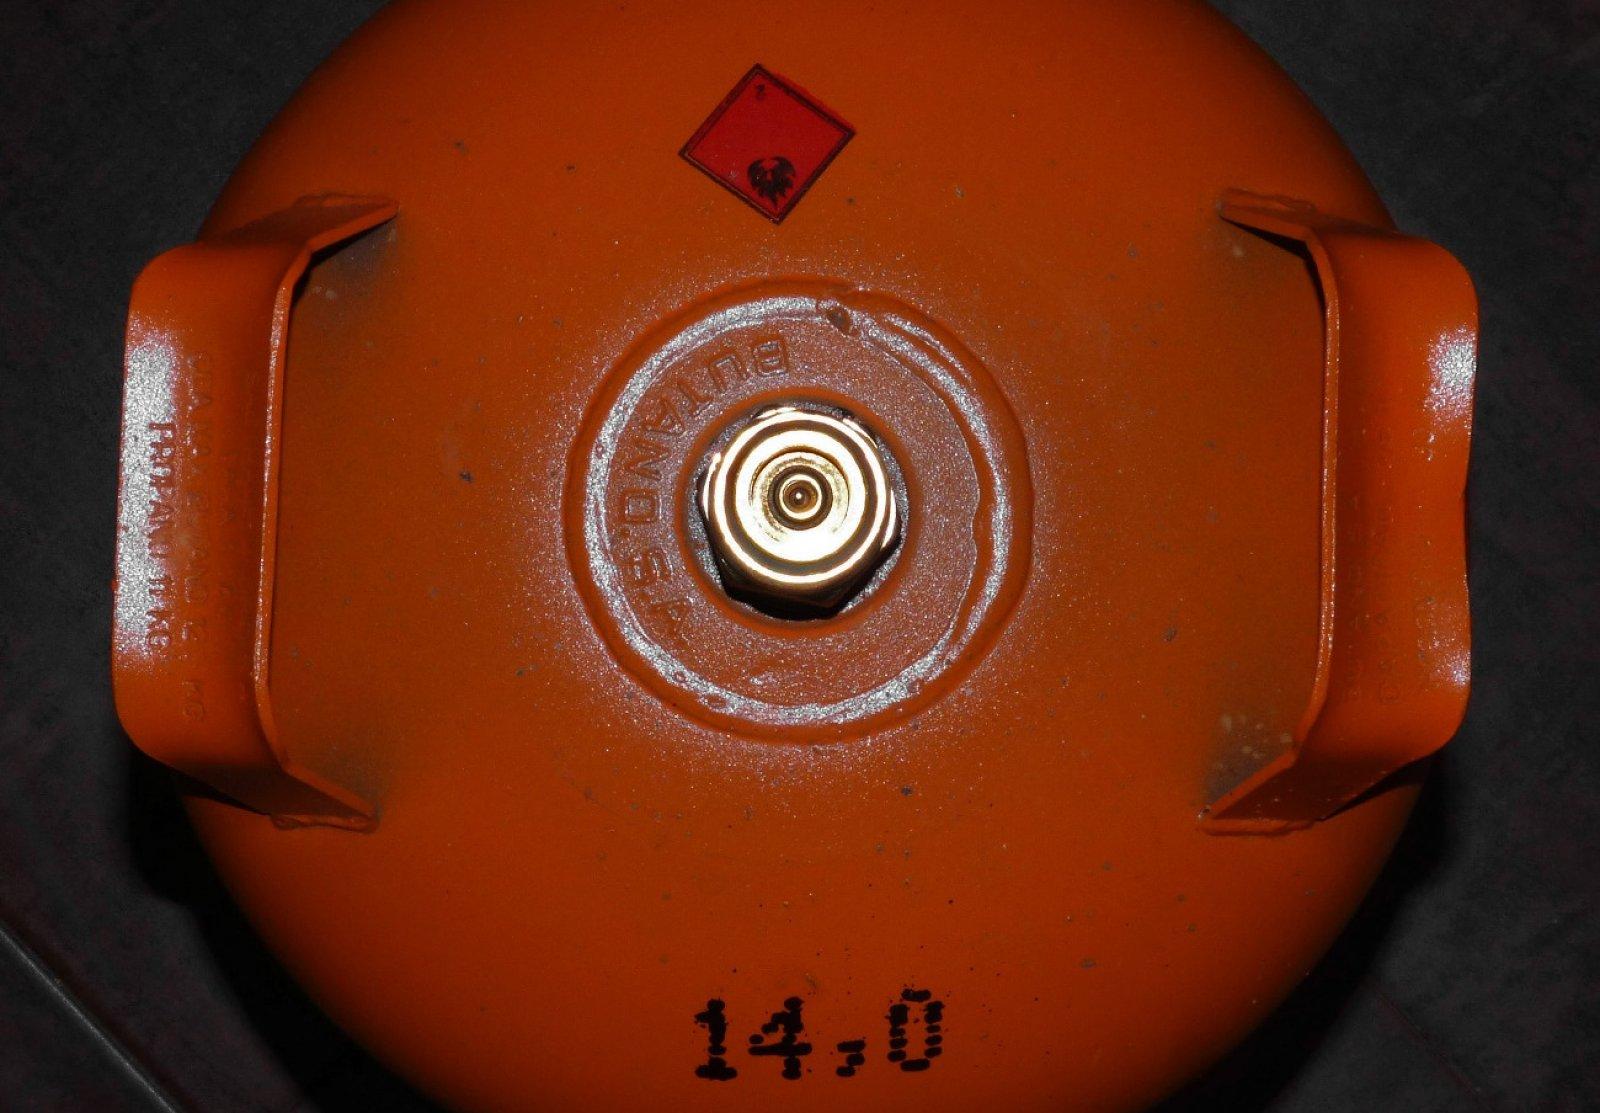 Bombona de butà